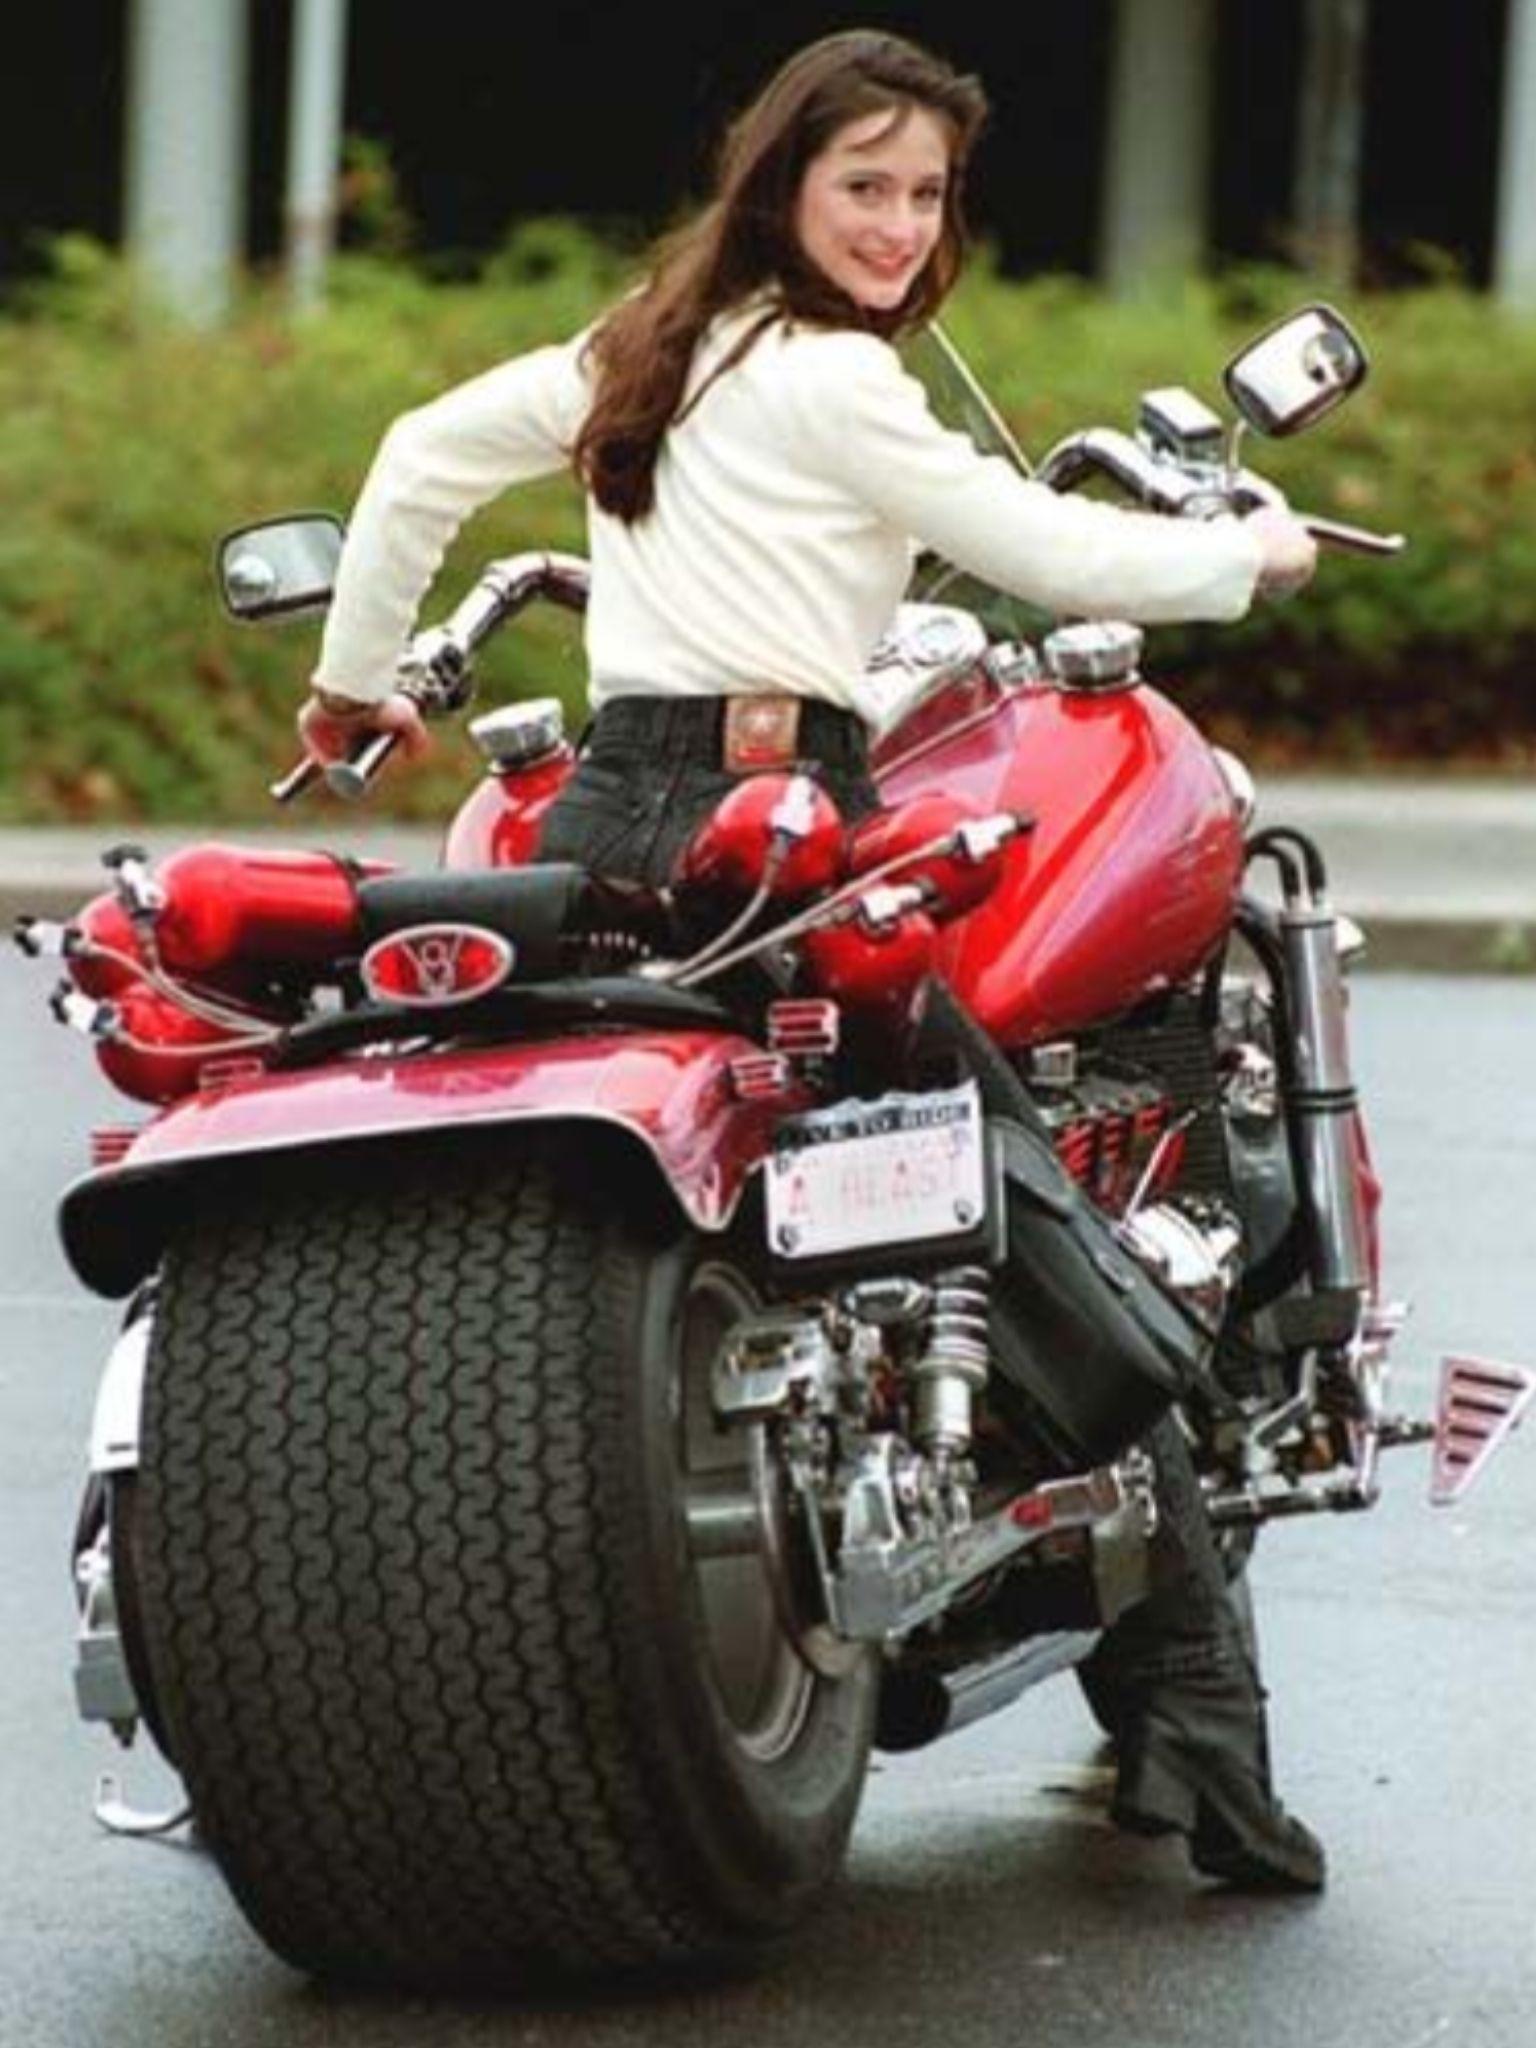 Pin By Hande Feyzioglu On Araba Pinterest Motorcycle Bike And Harley Engine Drawing Vquad Method Cars Motorcycles Custom Biker Girl Chick Hot Bikes